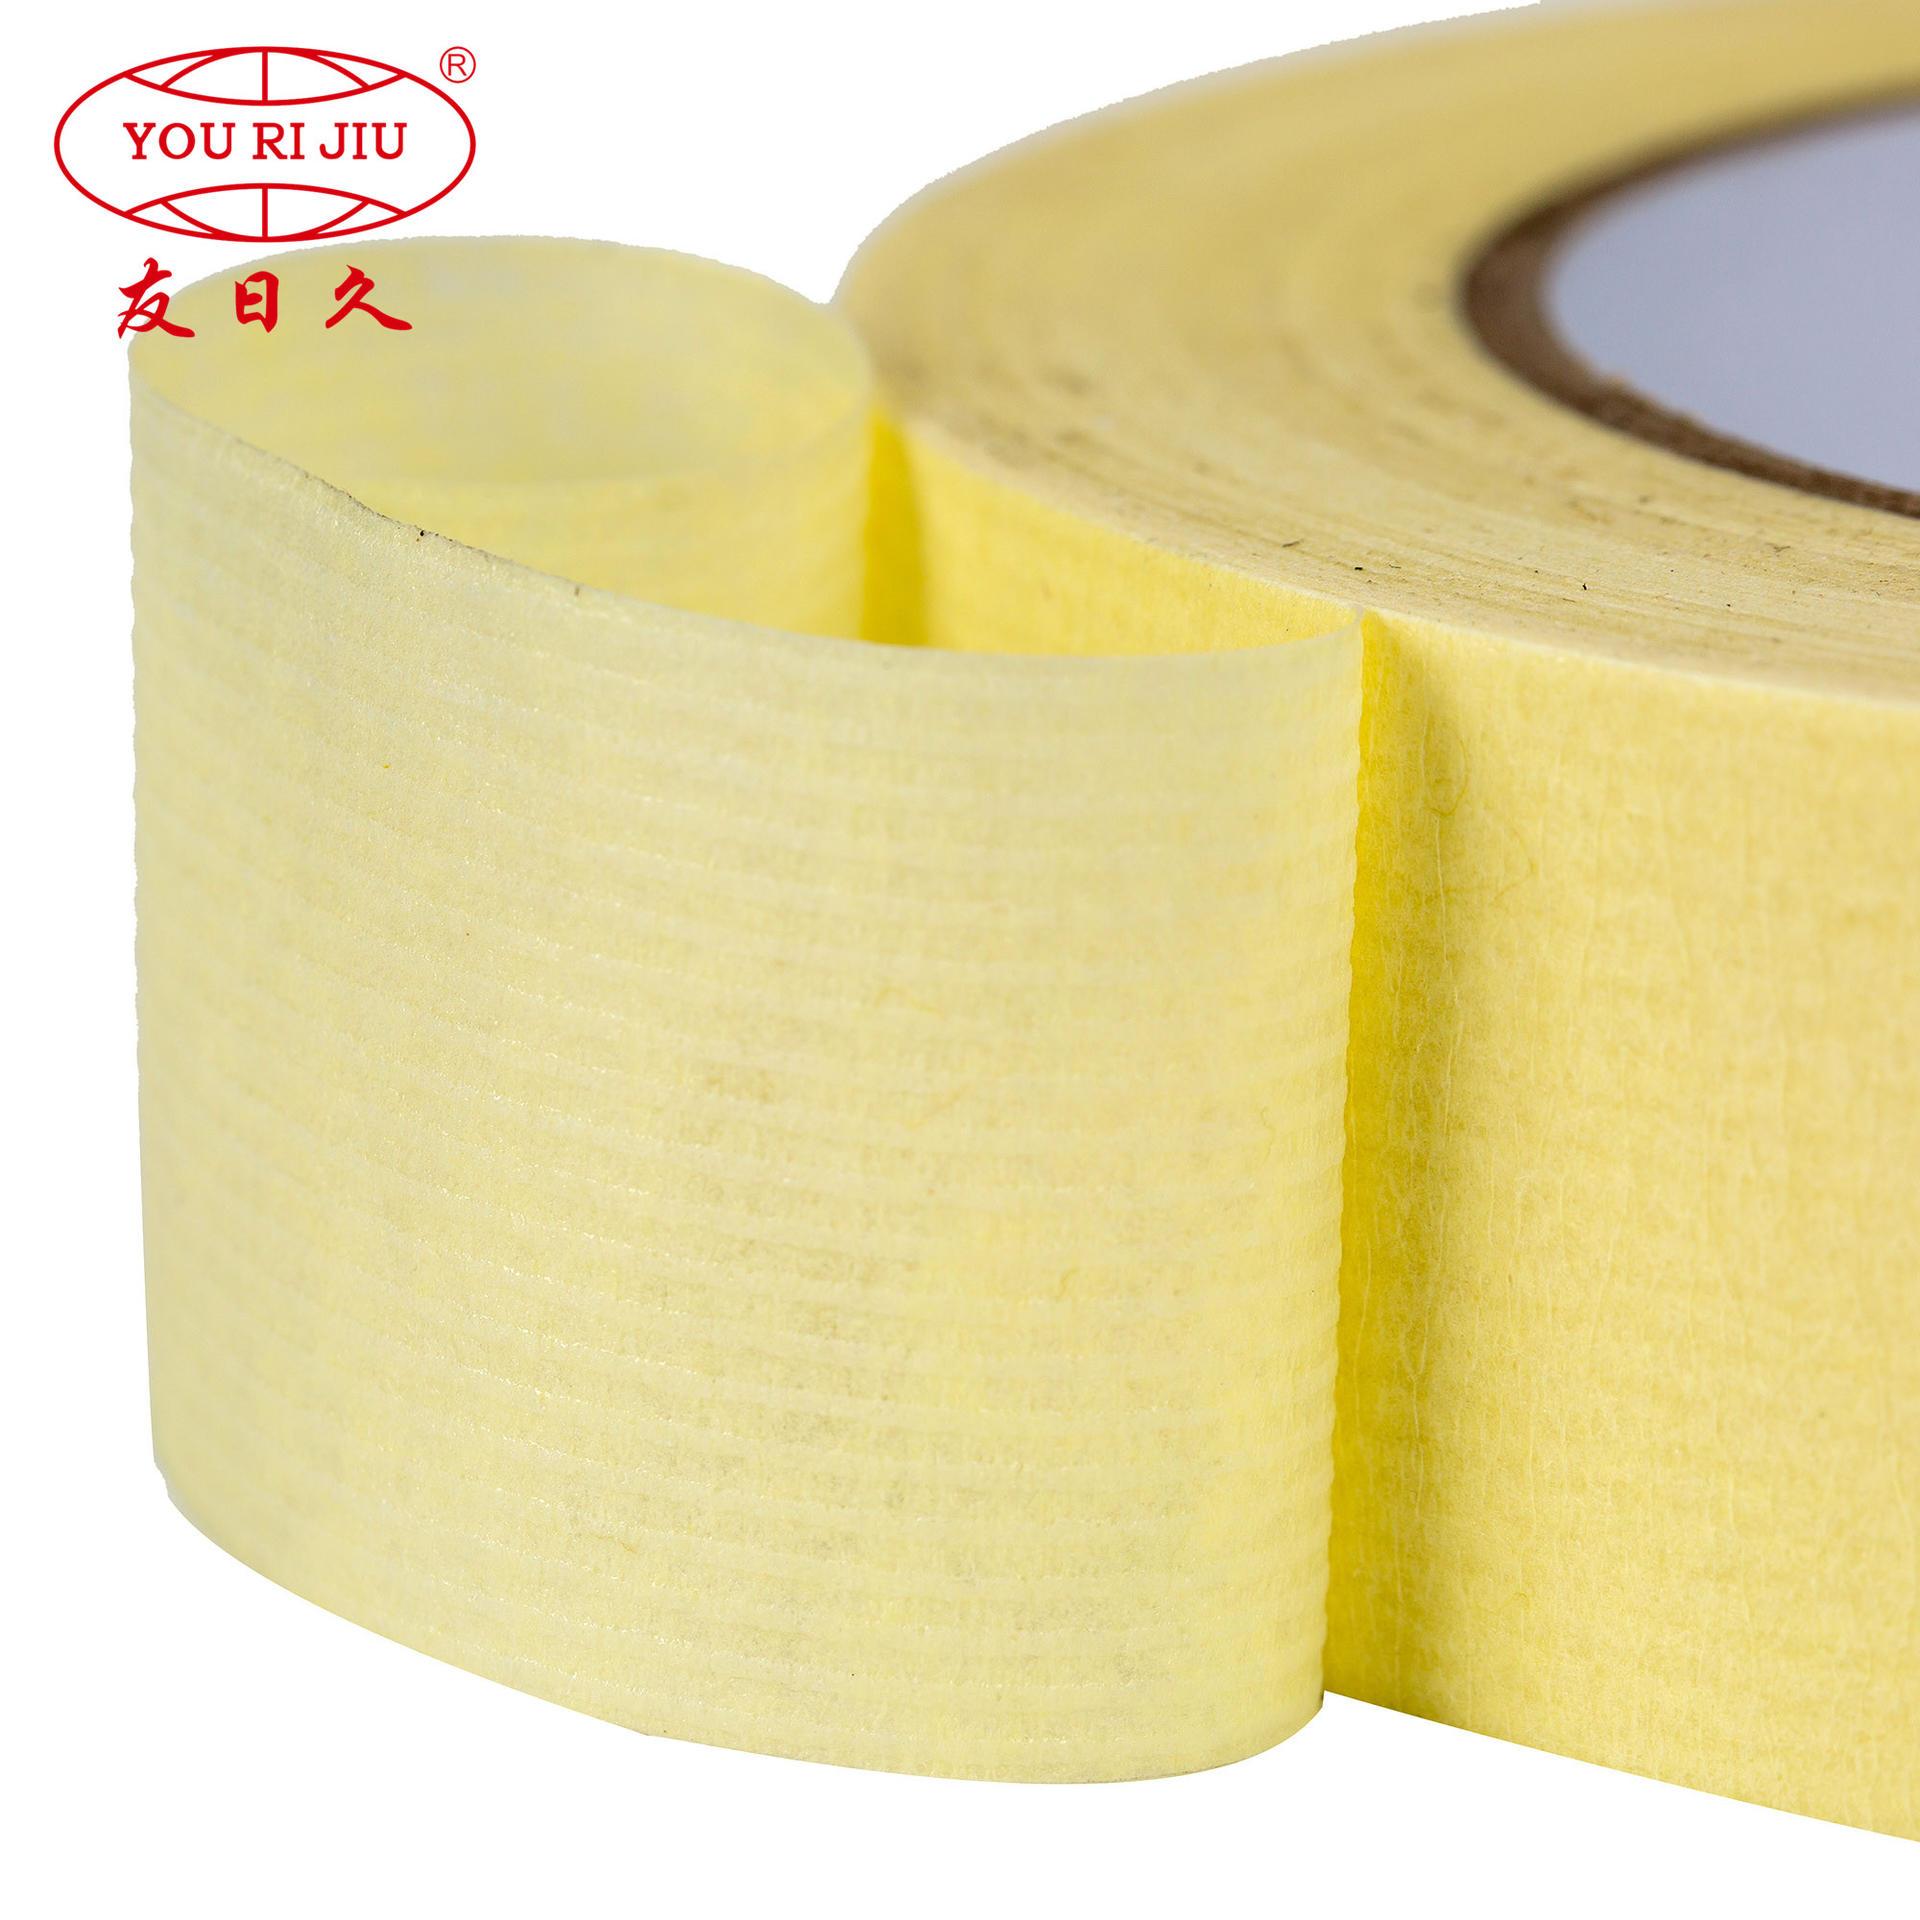 Crepe Paper Masking Tape for General Purpose